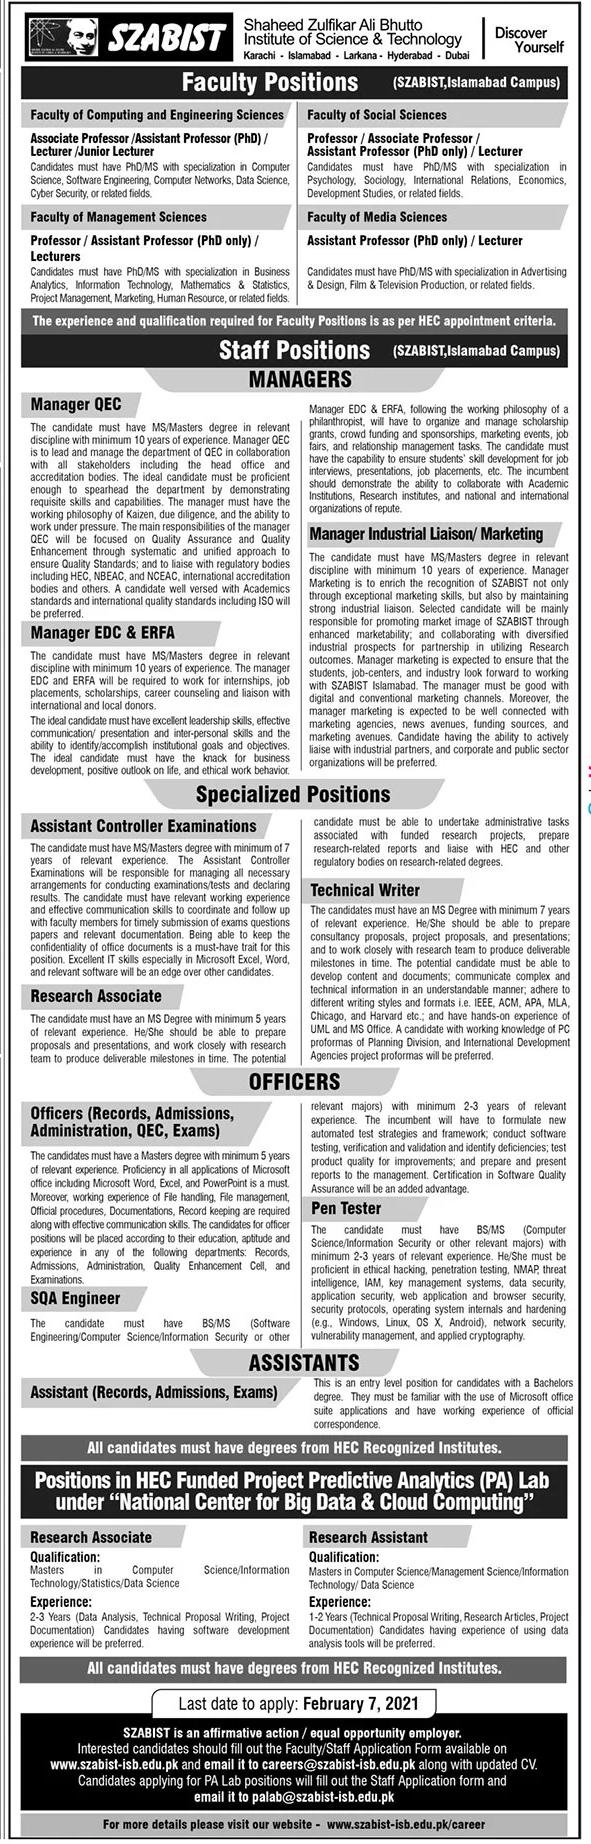 Shaheed Zulfiqar Ali Bhutto Institute of Science & Technology Jobs 2021